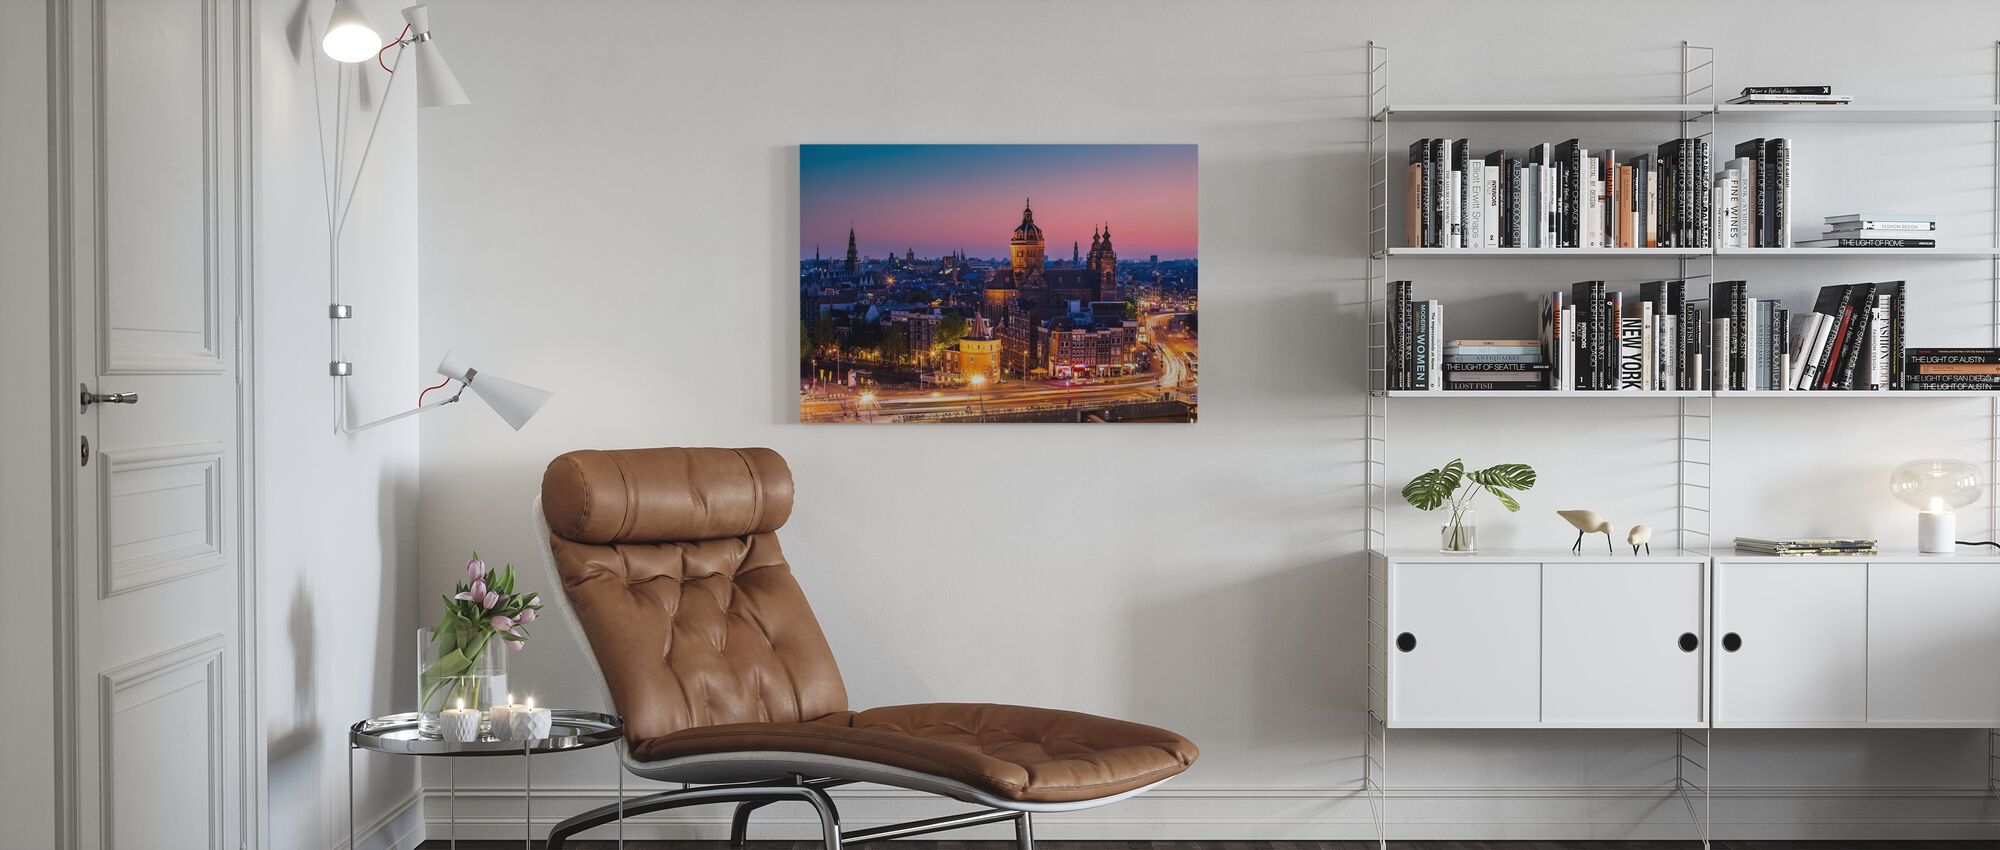 Amsterdam City - Canvas print - Living Room